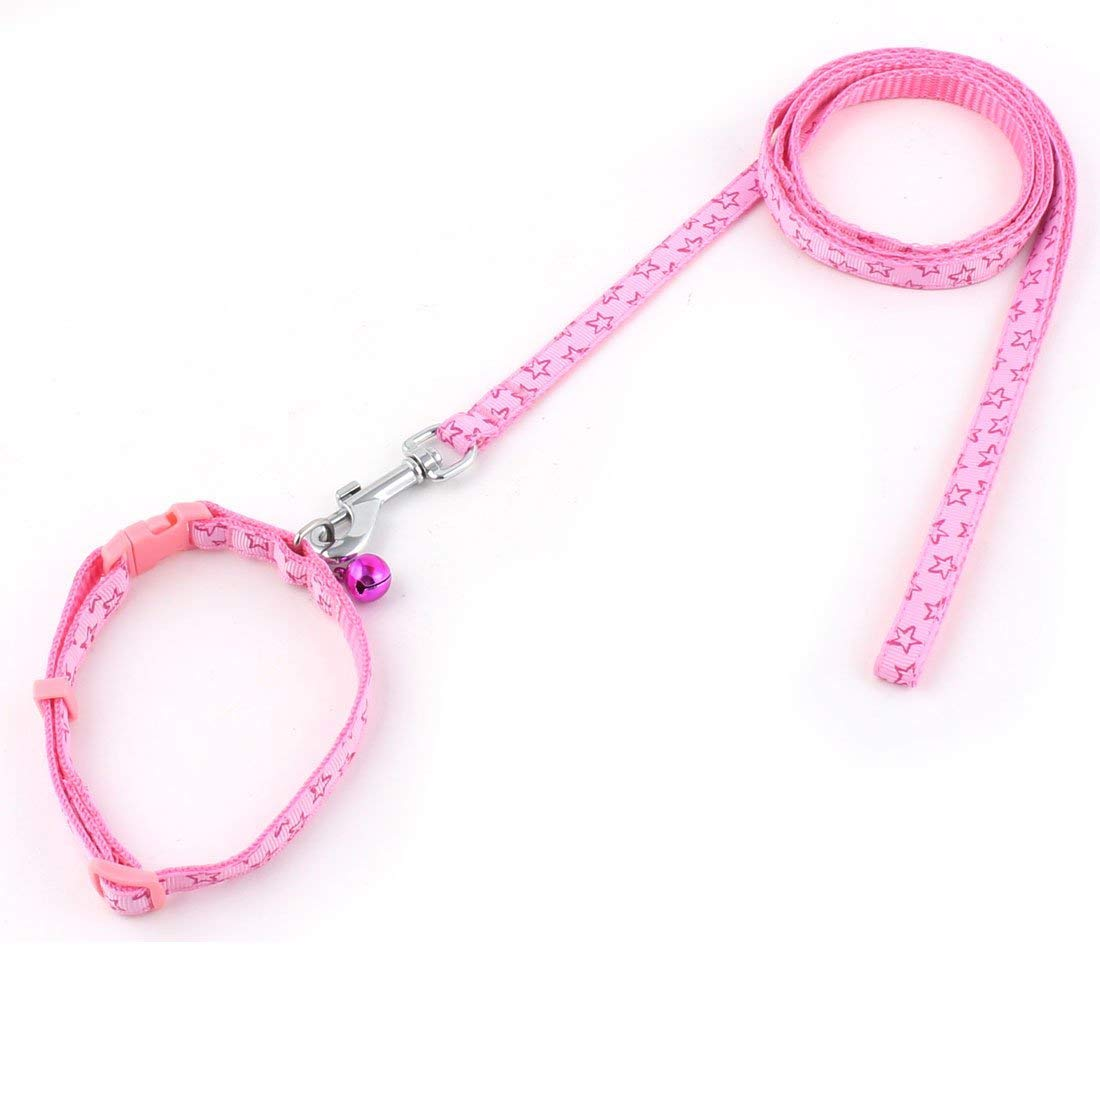 1Pc Pink   Puppy Dog Pet Bell Decor Star Pattern Collar Walking Training Lead Rope Leash